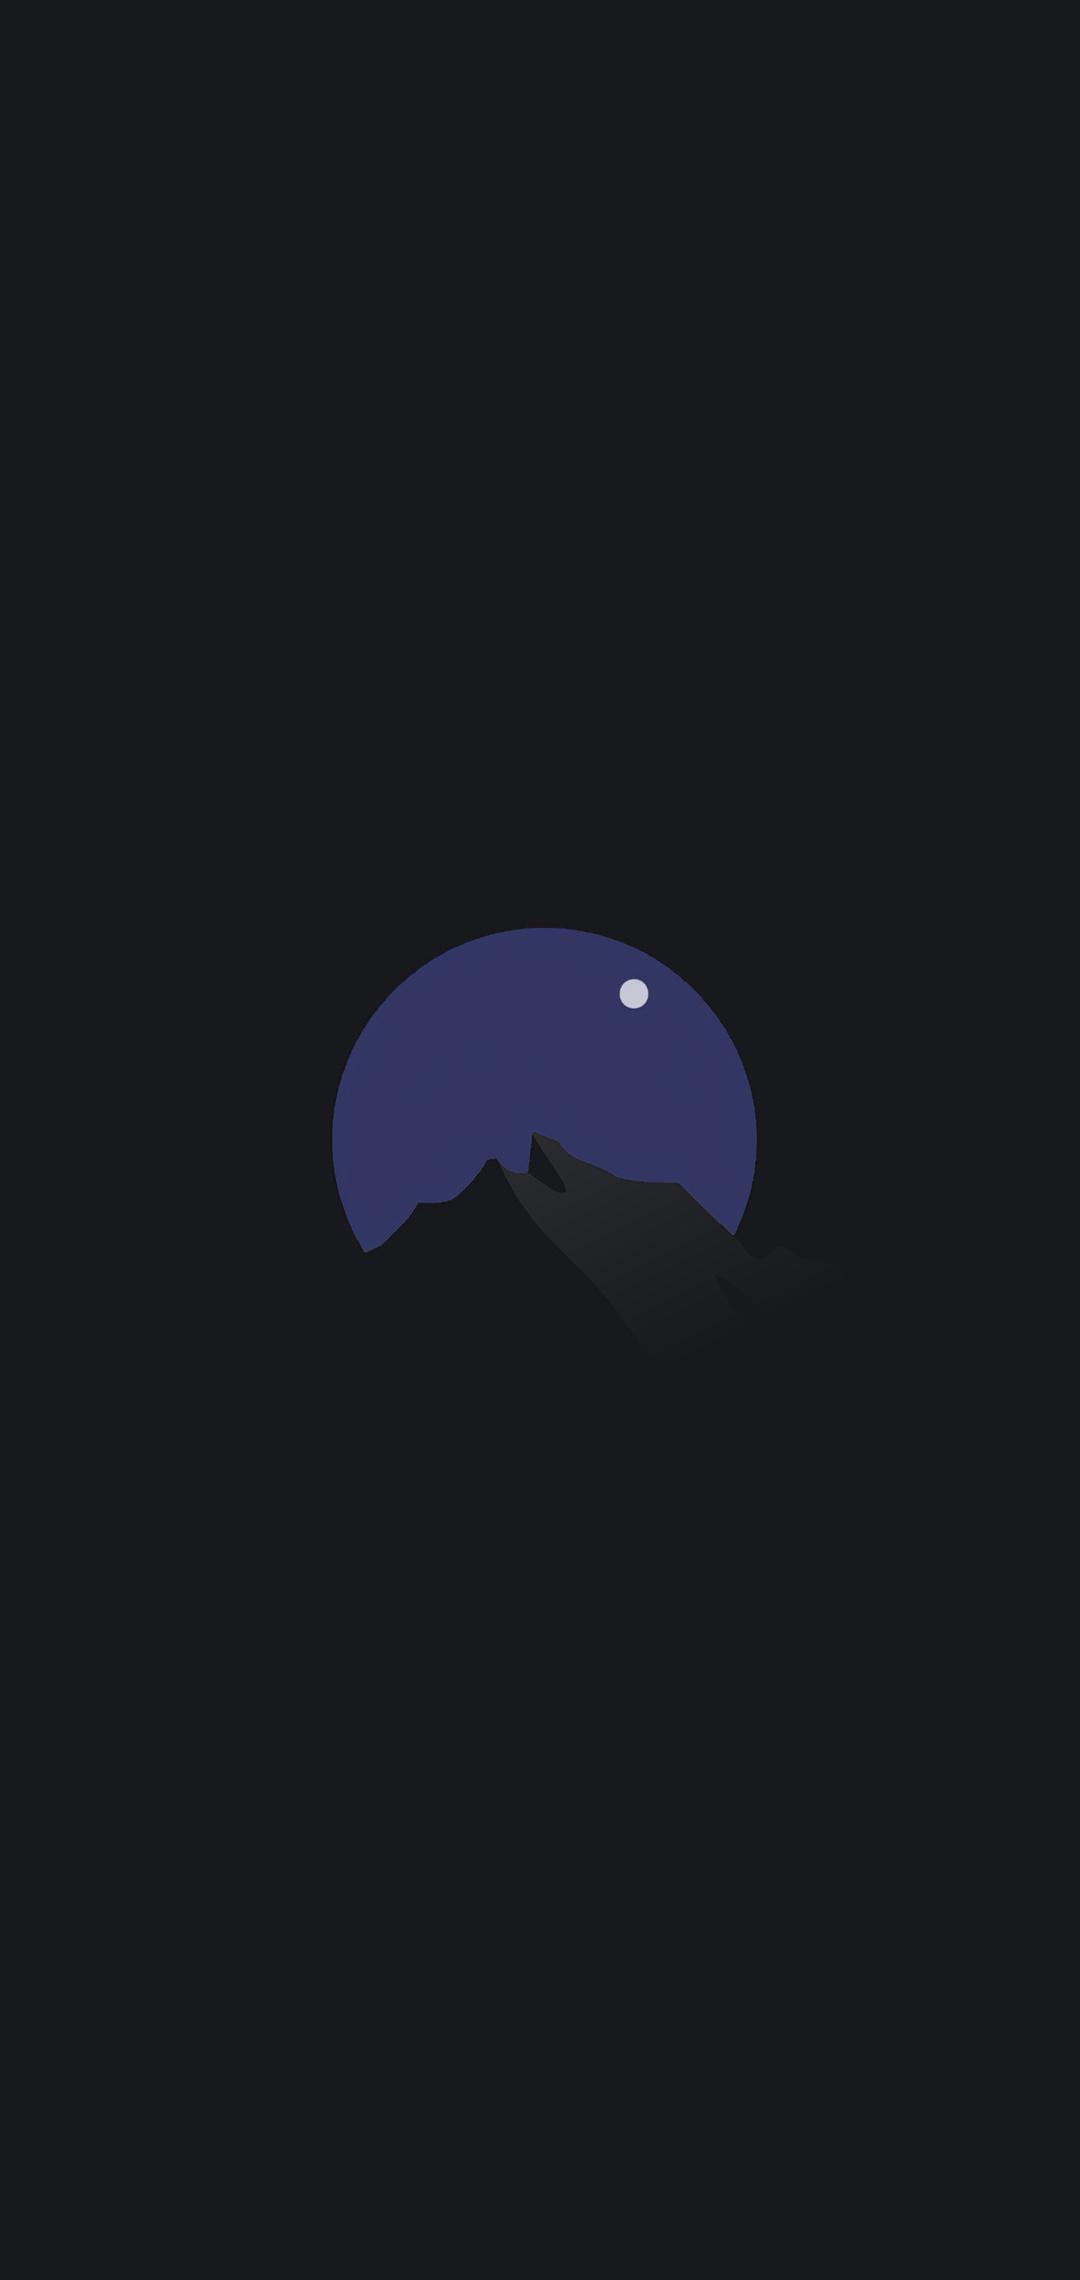 minimalism-circle-mountains-and-moon-5k-mg.jpg